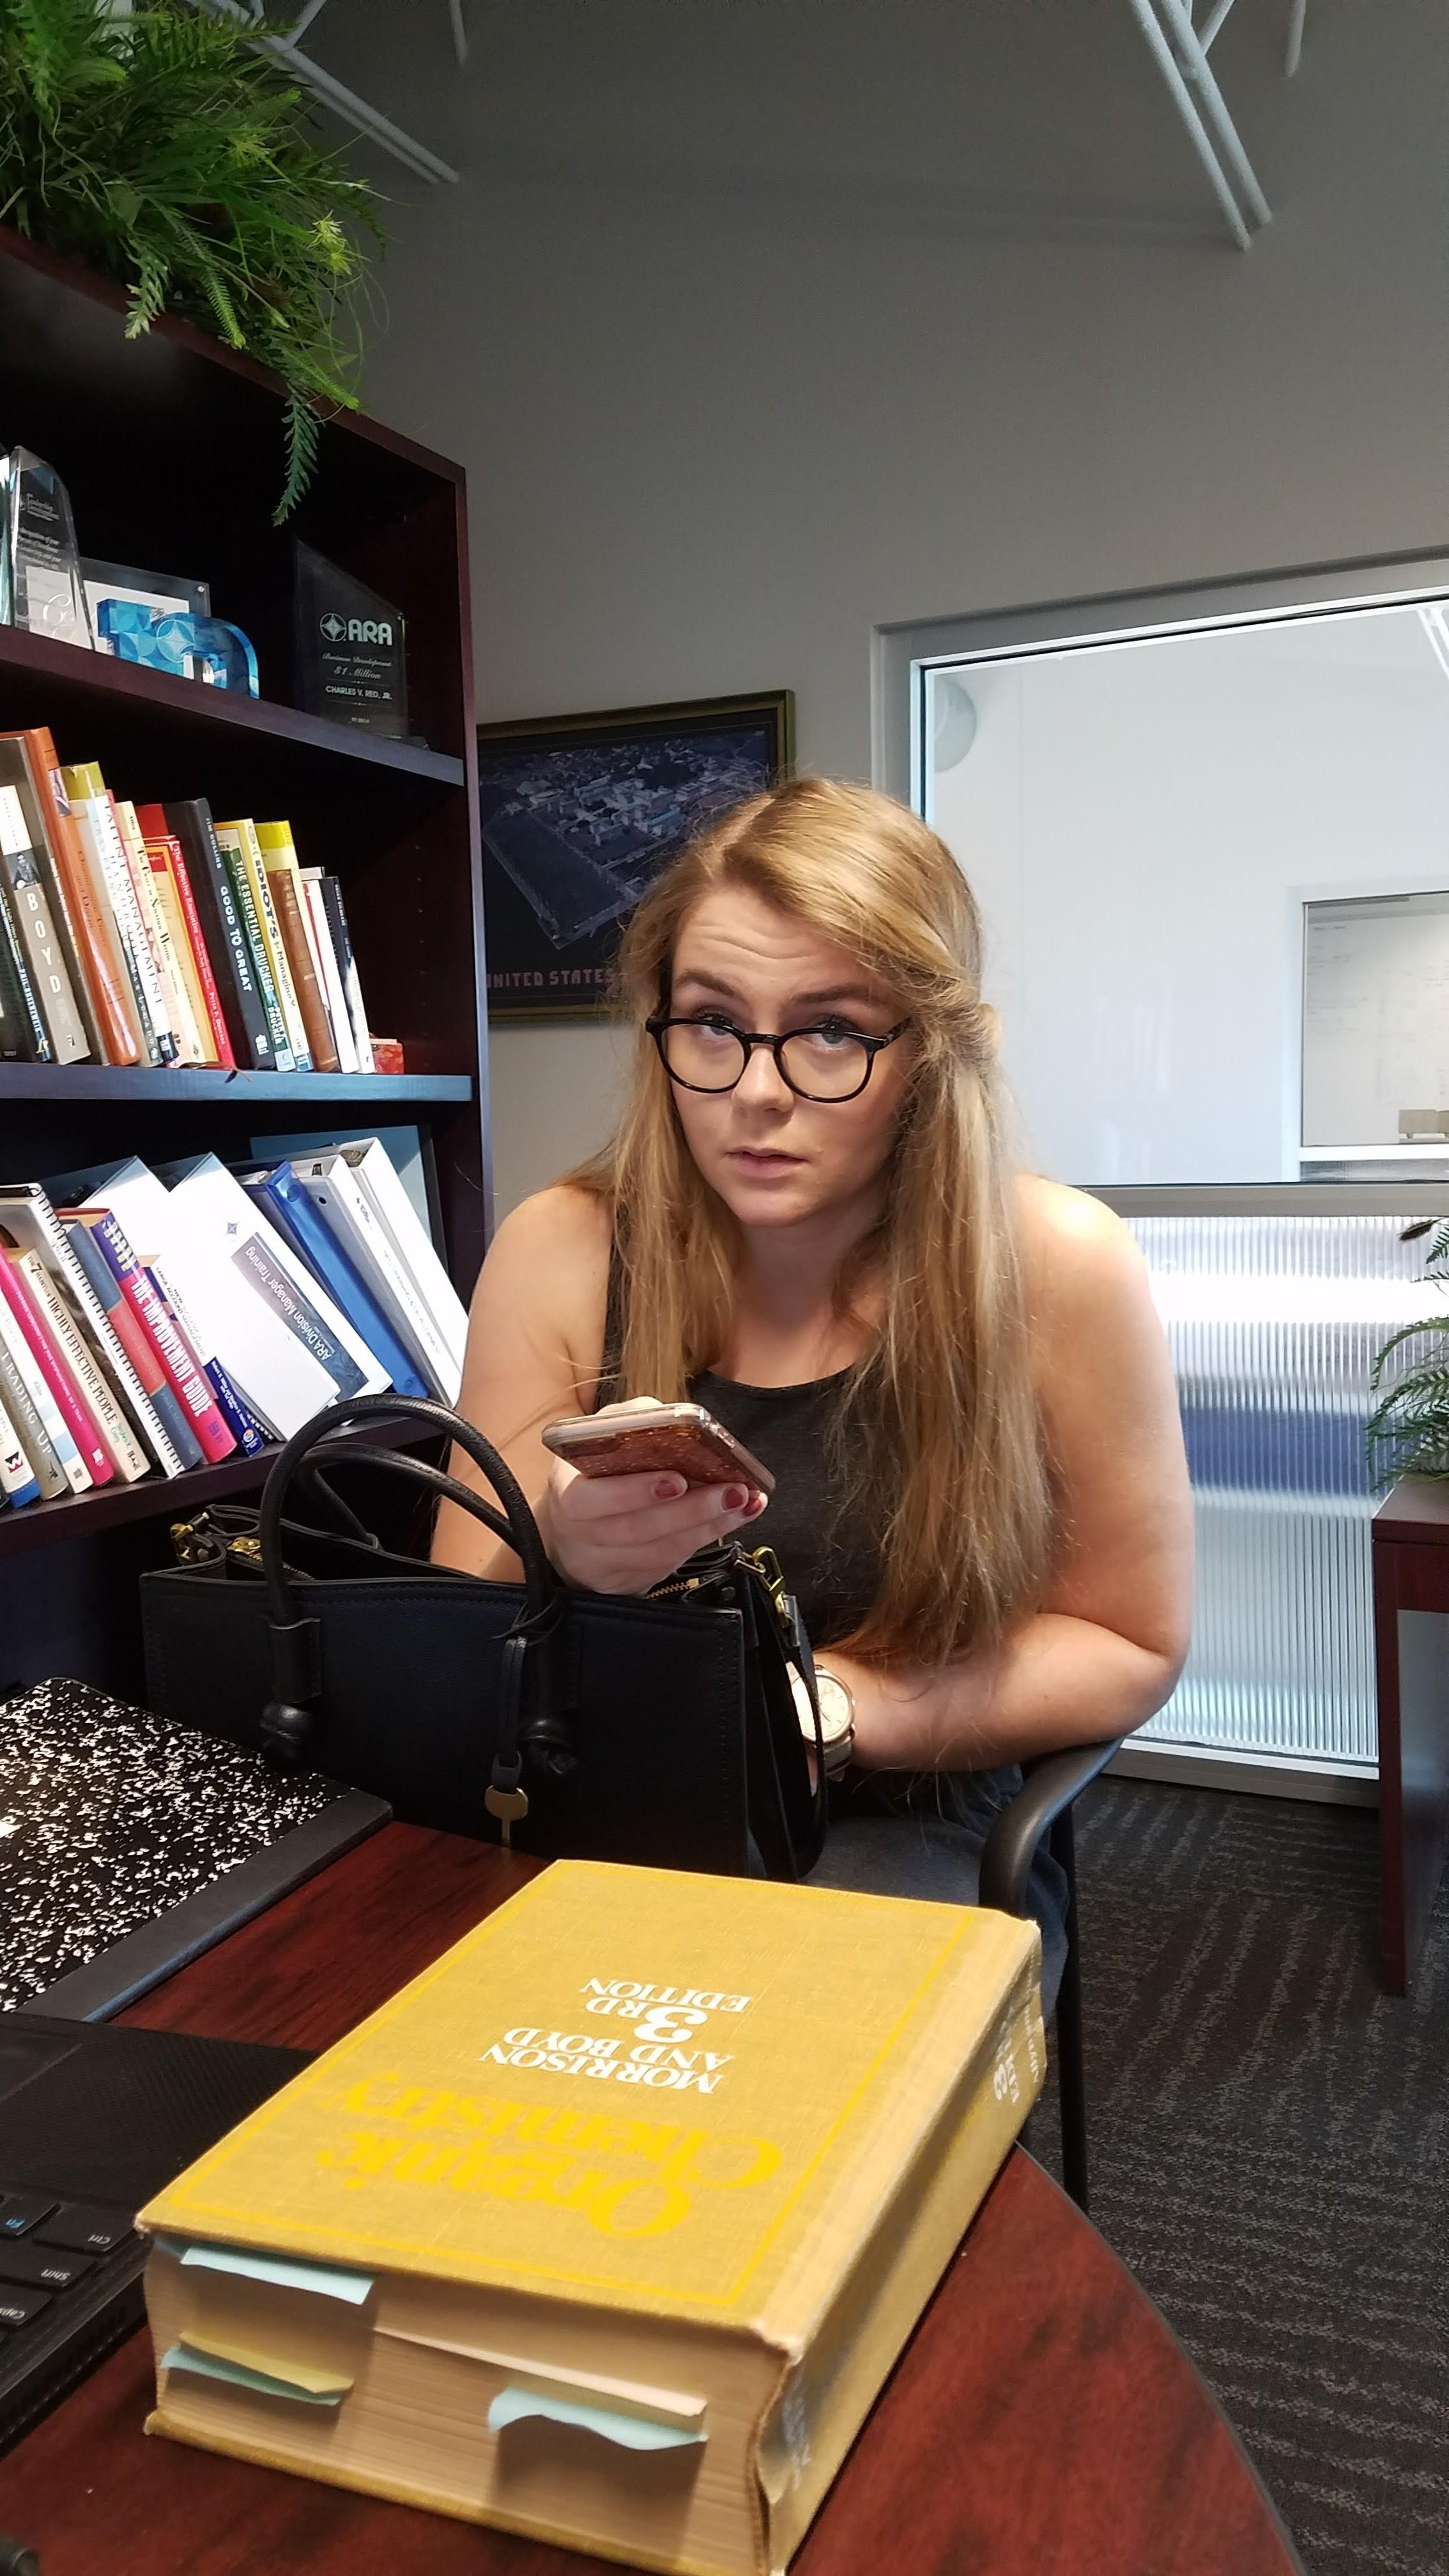 Rosie Red at a desk